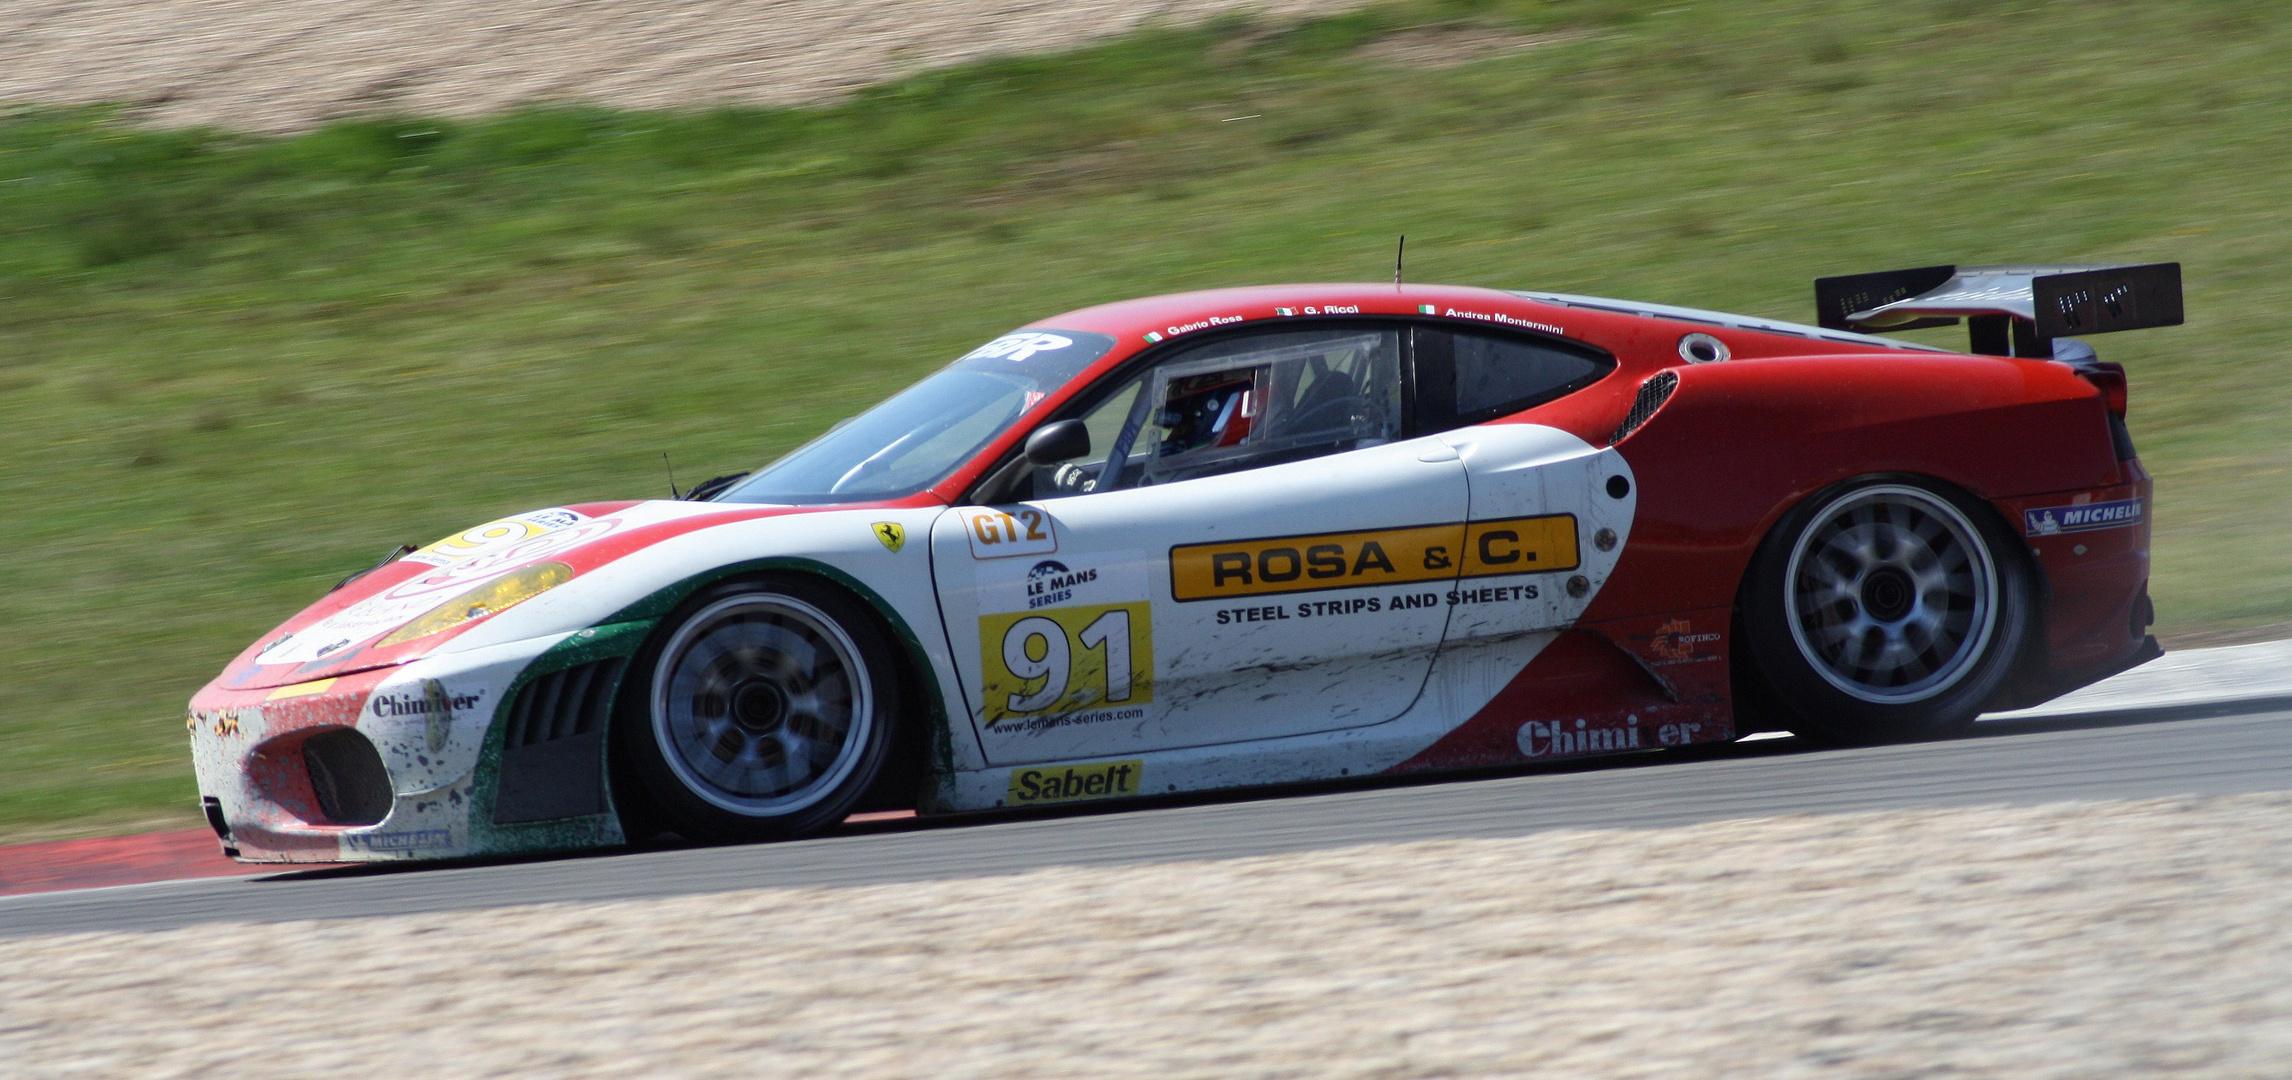 Ferrari allesisterlaubt Wochen 5